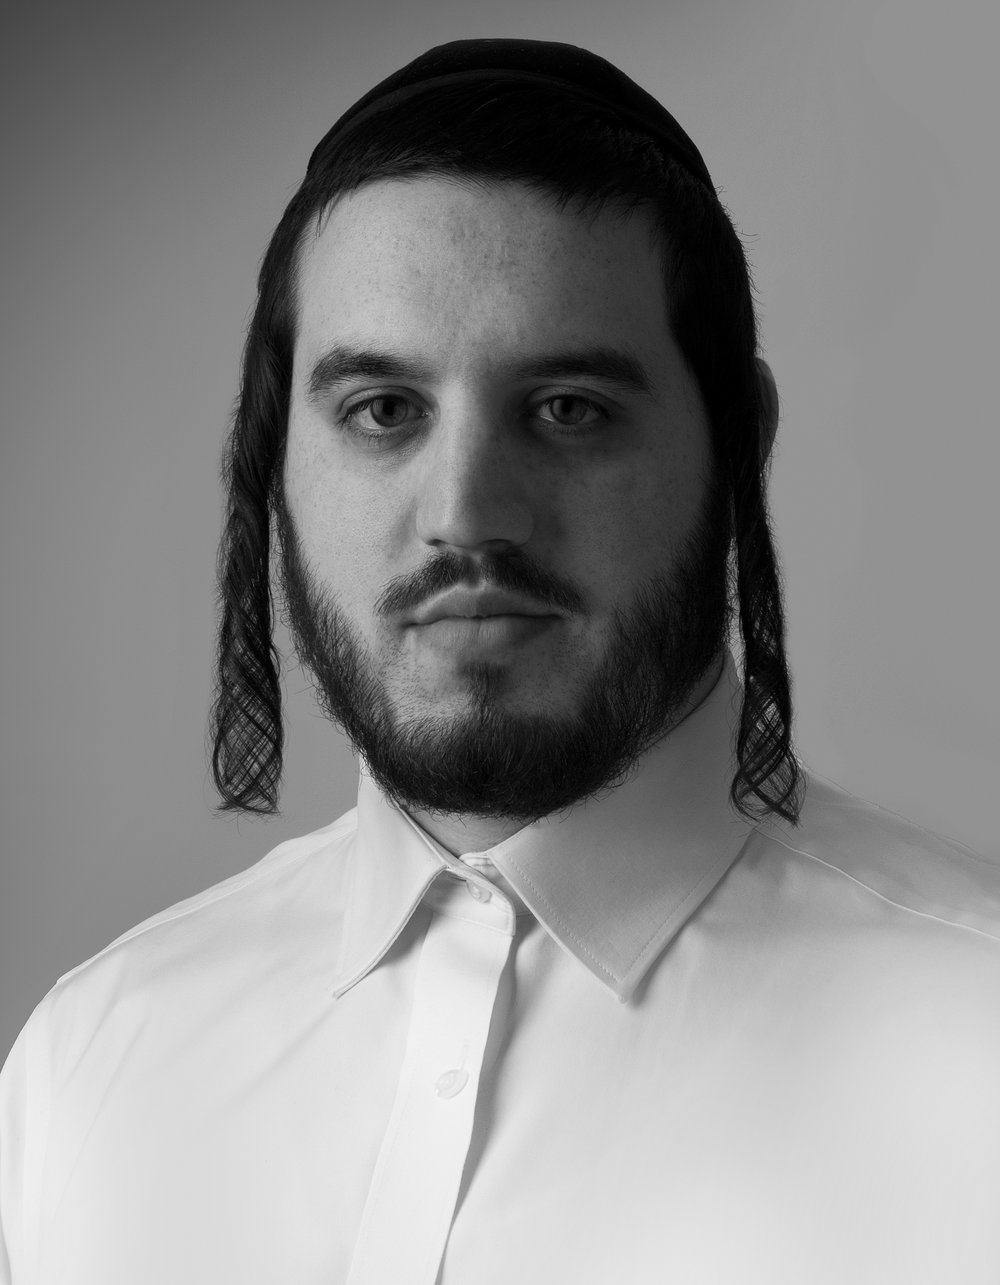 CEO Jacob Schwartz